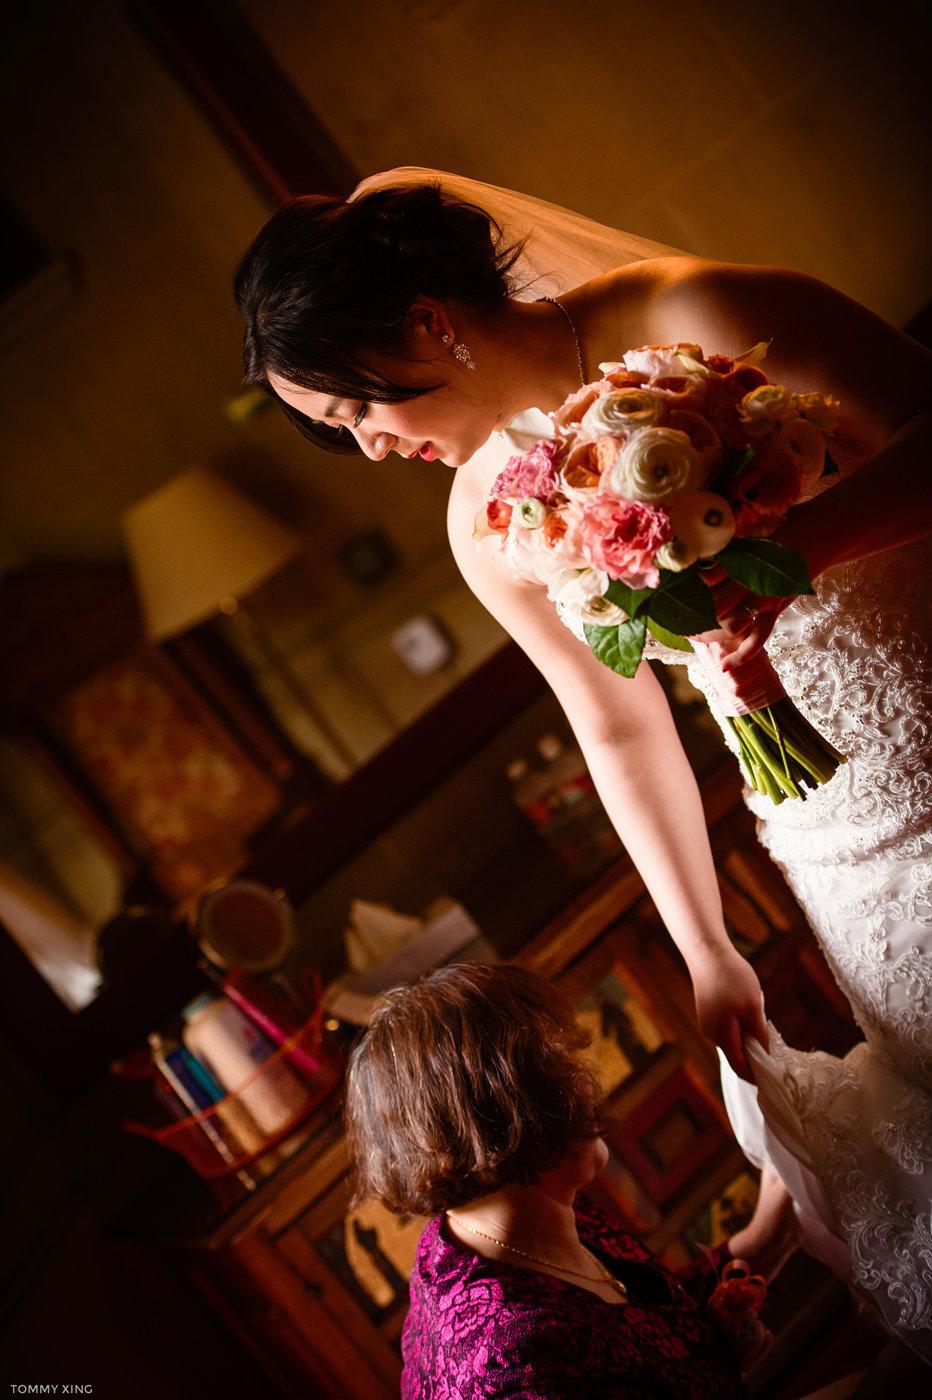 STANFORD MEMORIAL CHURCH WEDDING - Wenjie & Chengcheng - SAN FRANCISCO BAY AREA 斯坦福教堂婚礼跟拍 - 洛杉矶婚礼婚纱照摄影师 Tommy Xing Photography046.jpg